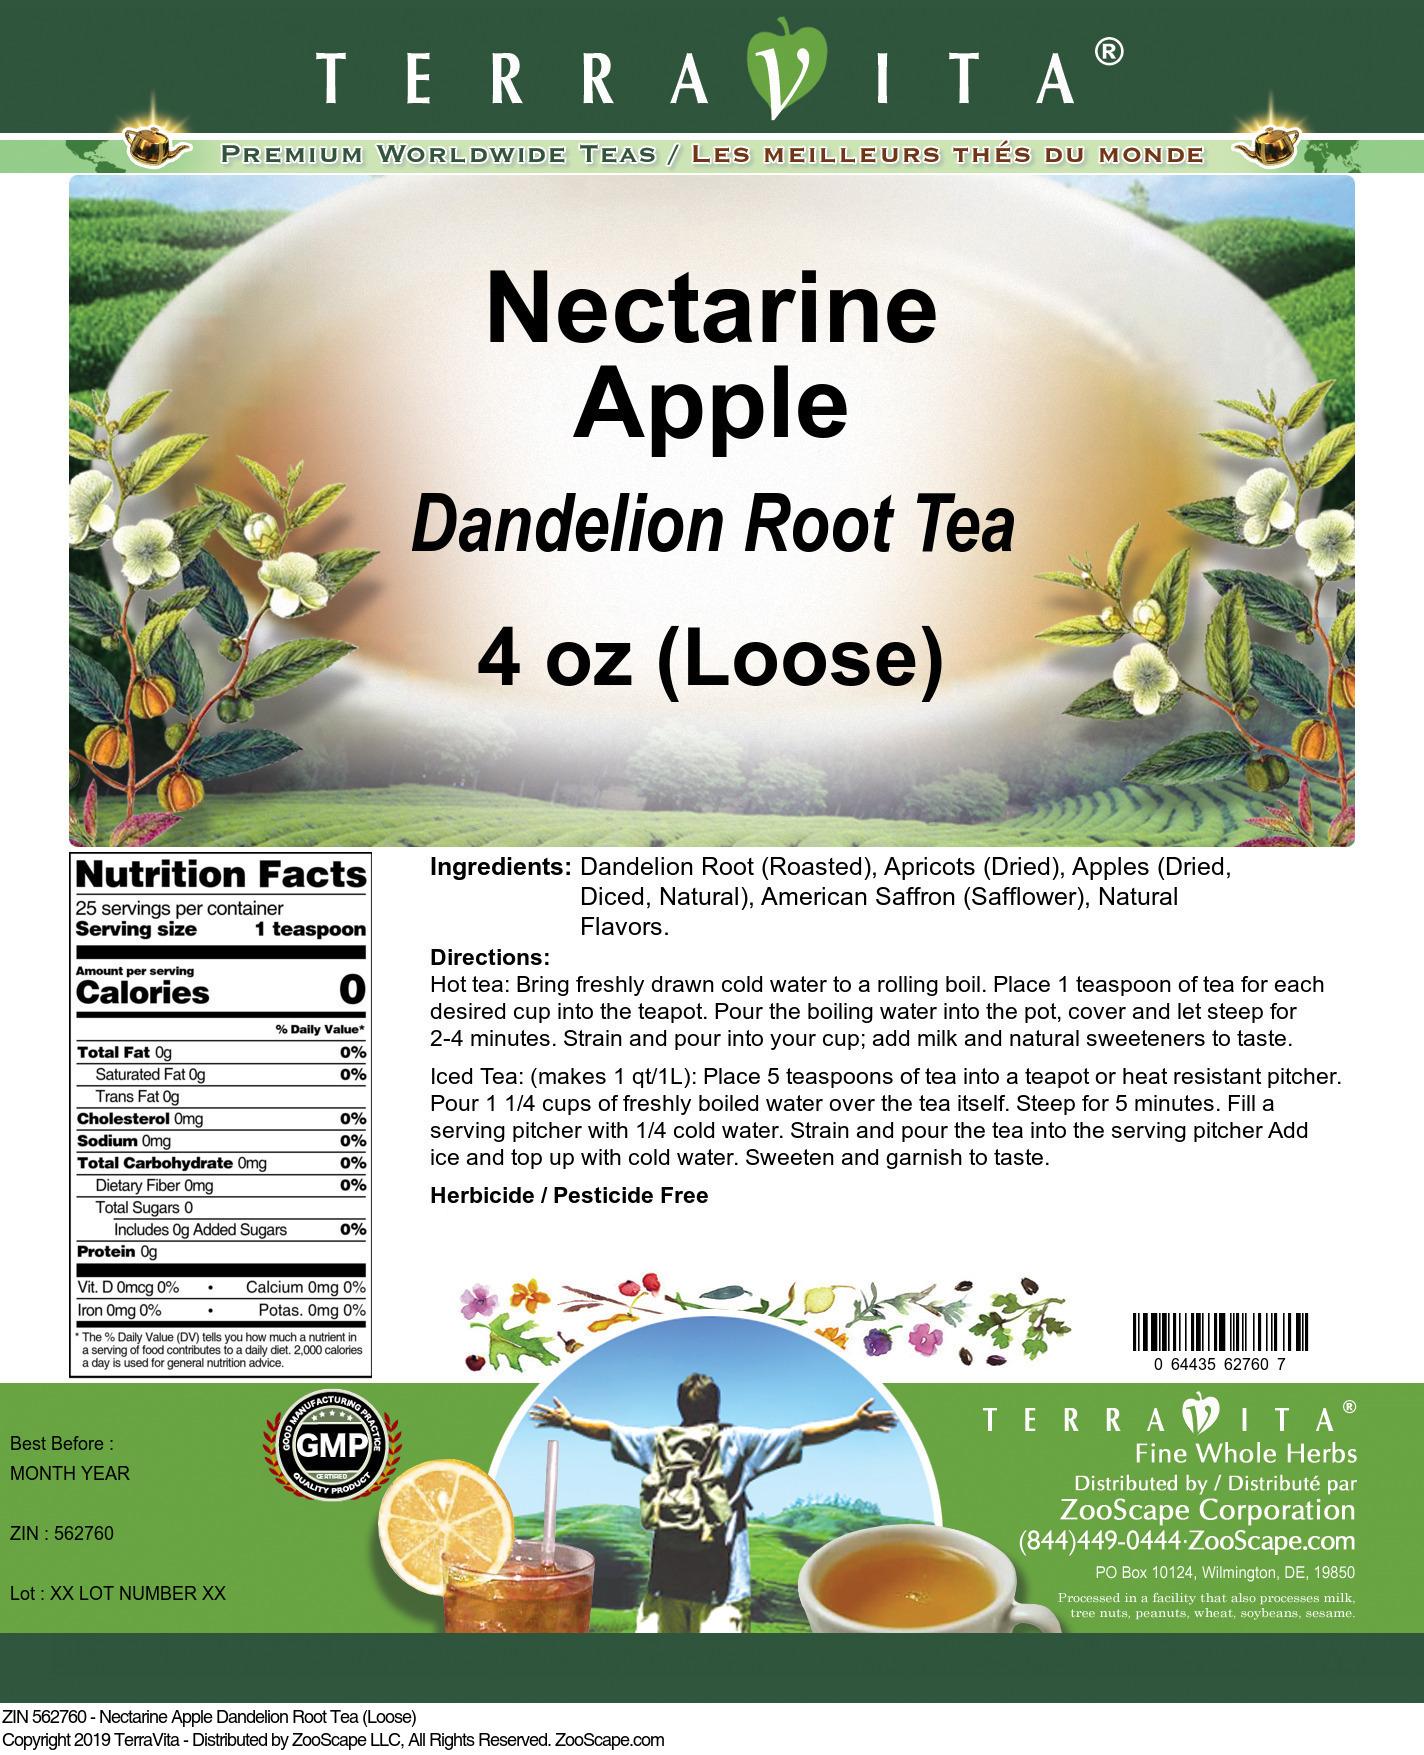 Nectarine Apple Dandelion Root Tea (Loose)